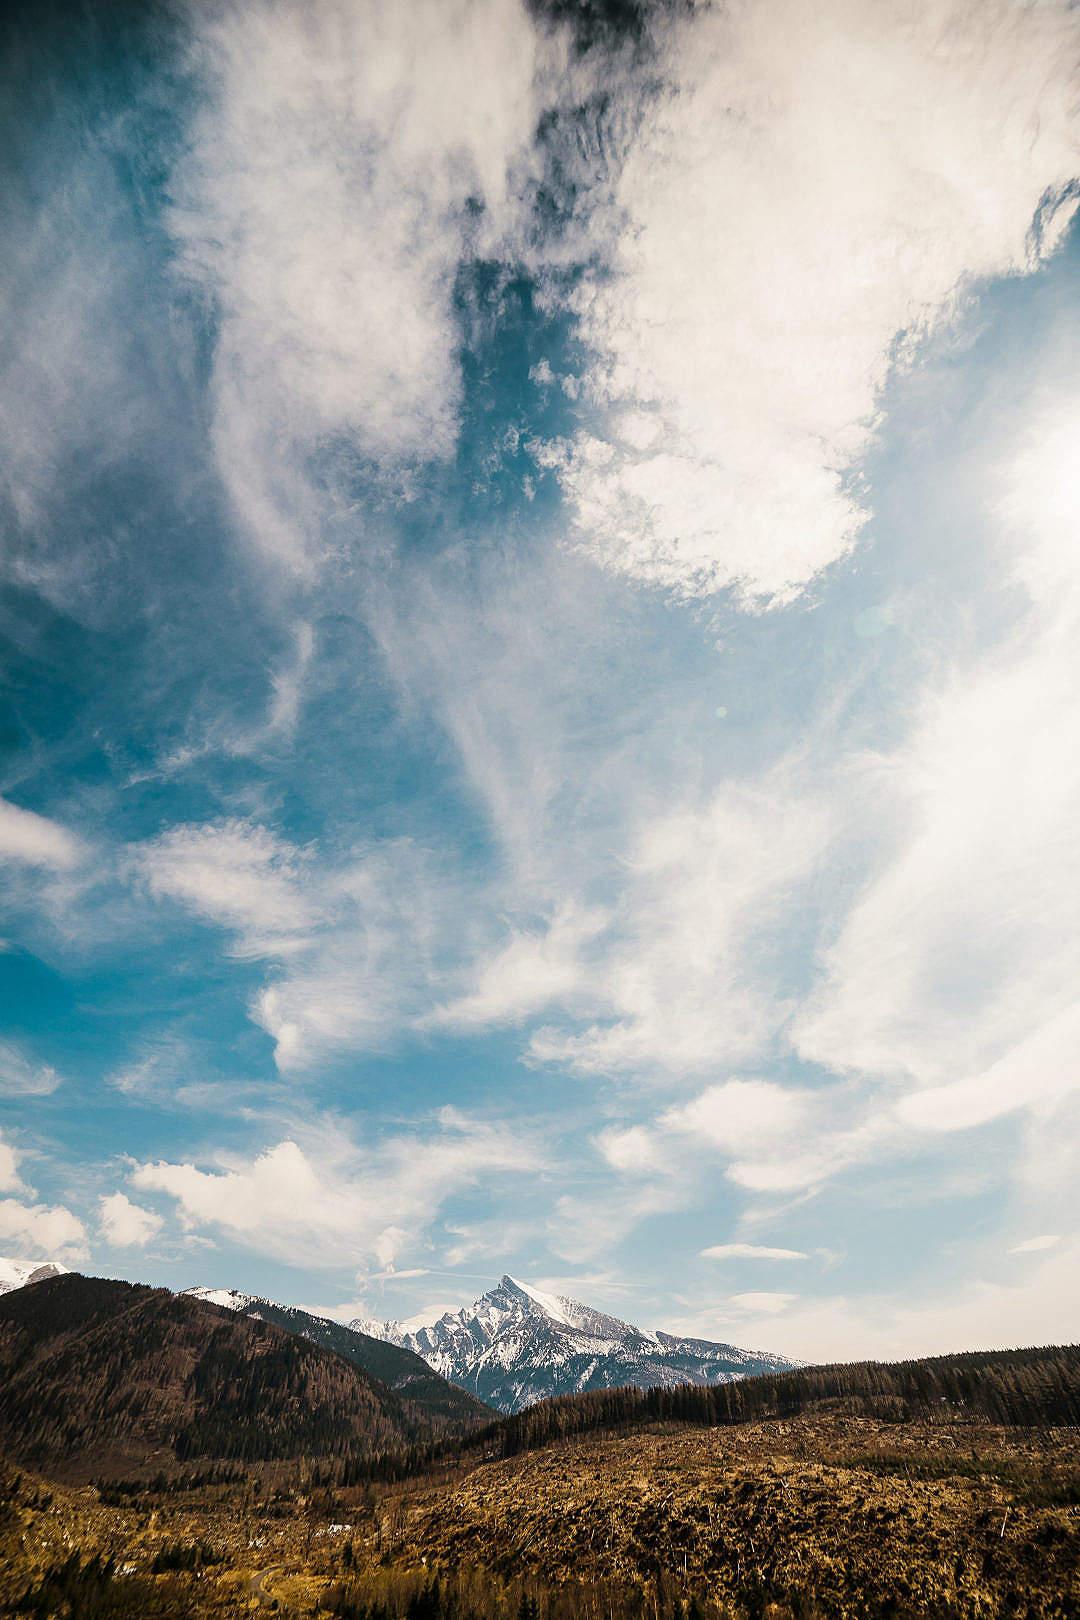 Download Krivan Mountain in High Tatras, Slovakia Vertical FREE Stock Photo